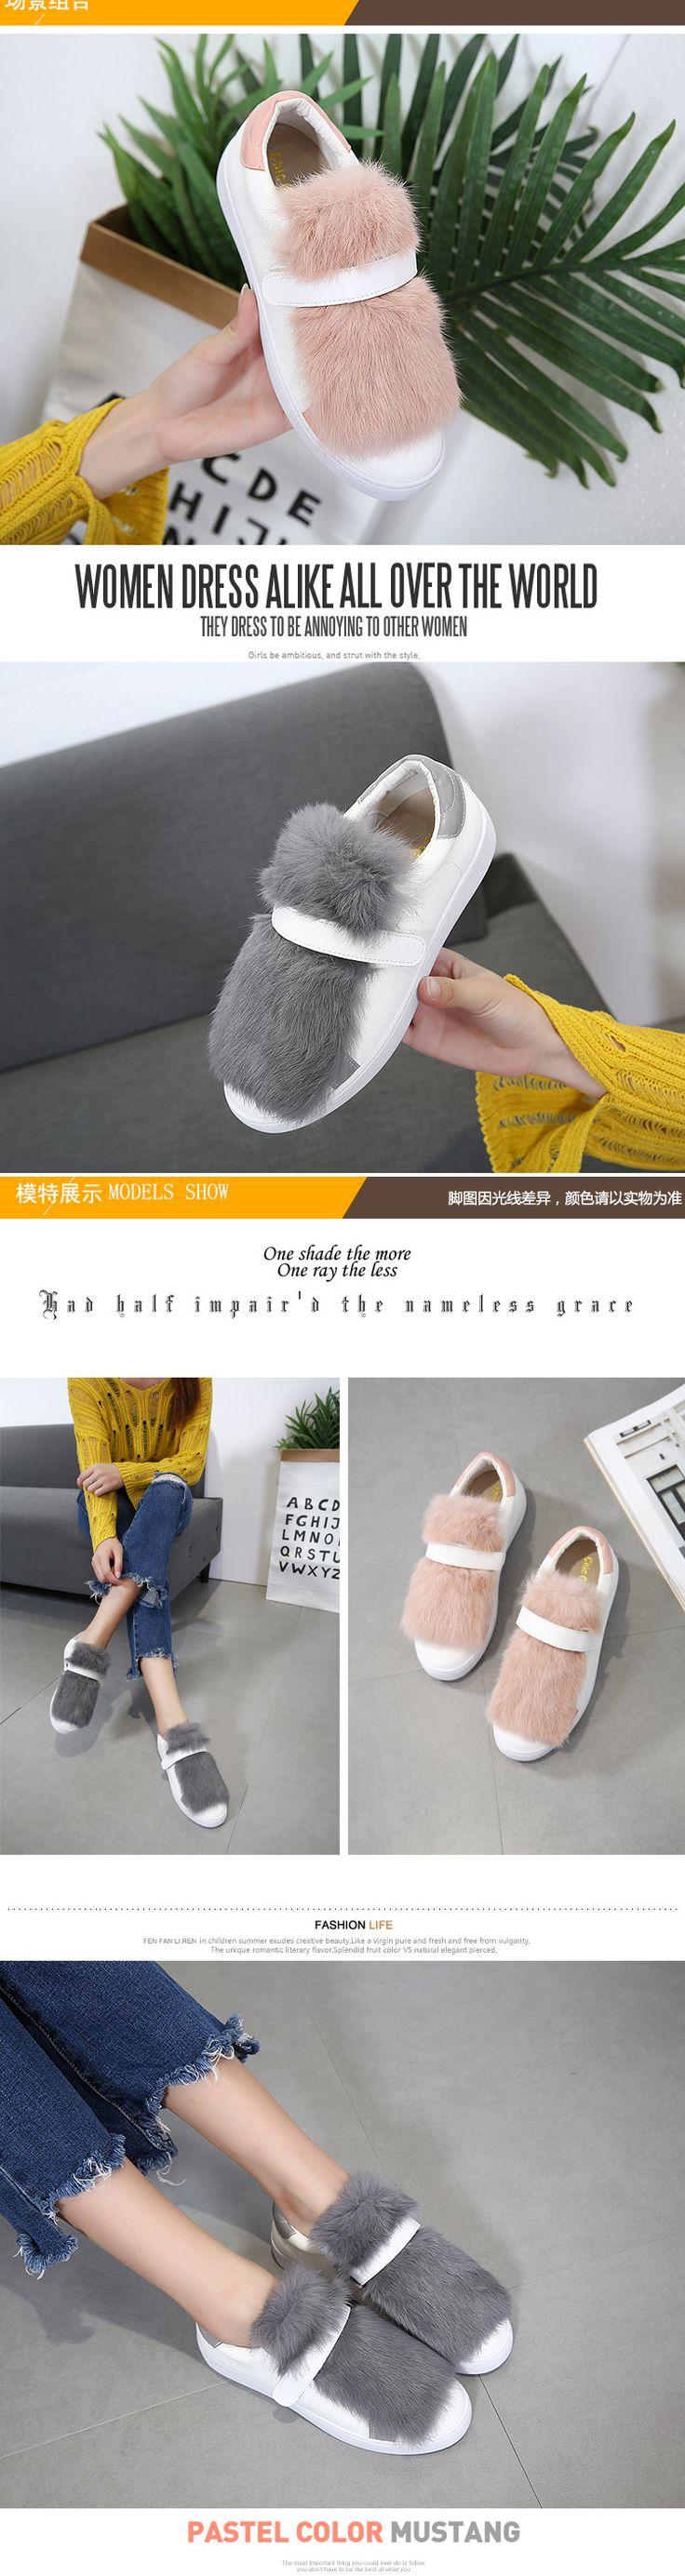 2017 Women Natural Rabbit Fur Loafers Platform Slipony Flat Heel Shoes Slip On Brand Designer Furry Flats Fuzzy Ladies Shoe-in Women's Flats from Shoes on Aliexpress.com | Alibaba Group